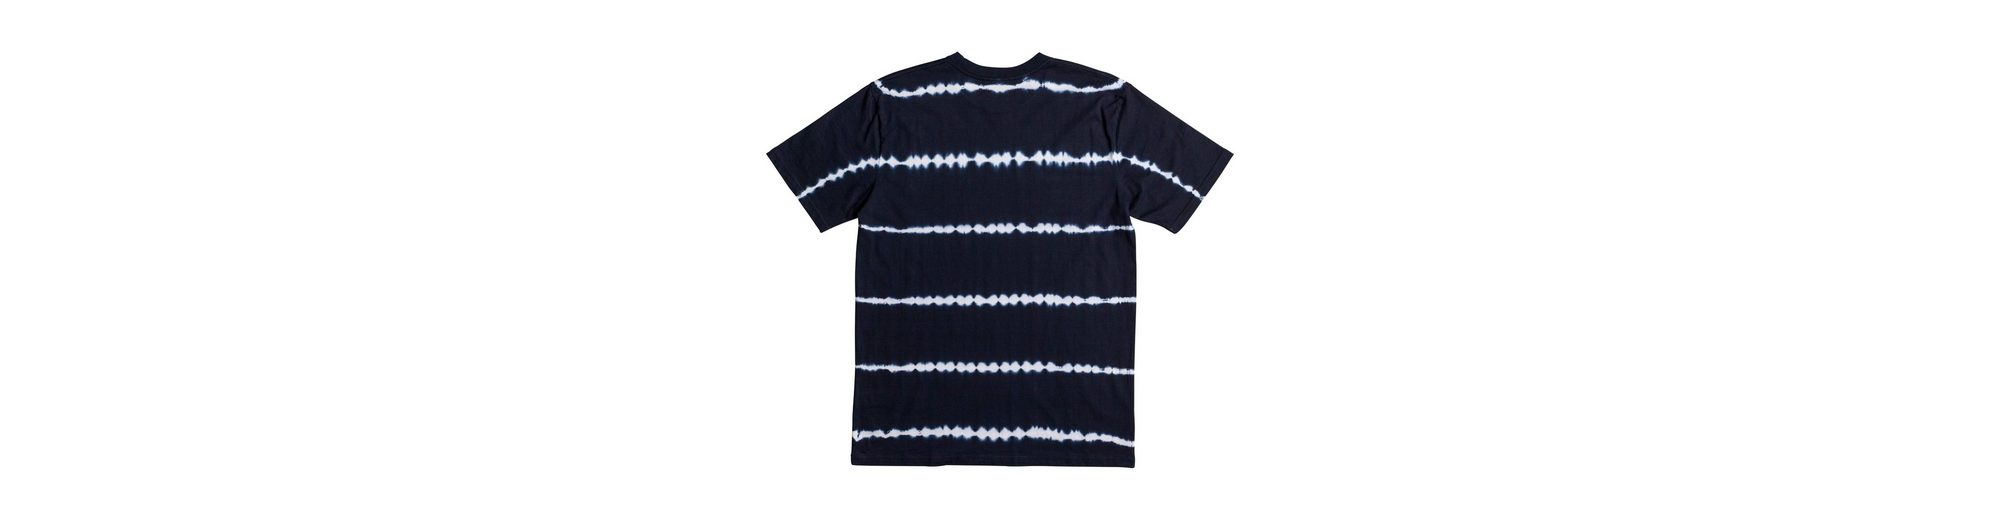 DC Shoes T-Shirt Minimal 17 Billig Große Diskont Günstig Kaufen Outlet-Store Günstige Verkaufspreise Auslass 2018 Neu xmQKDjrz